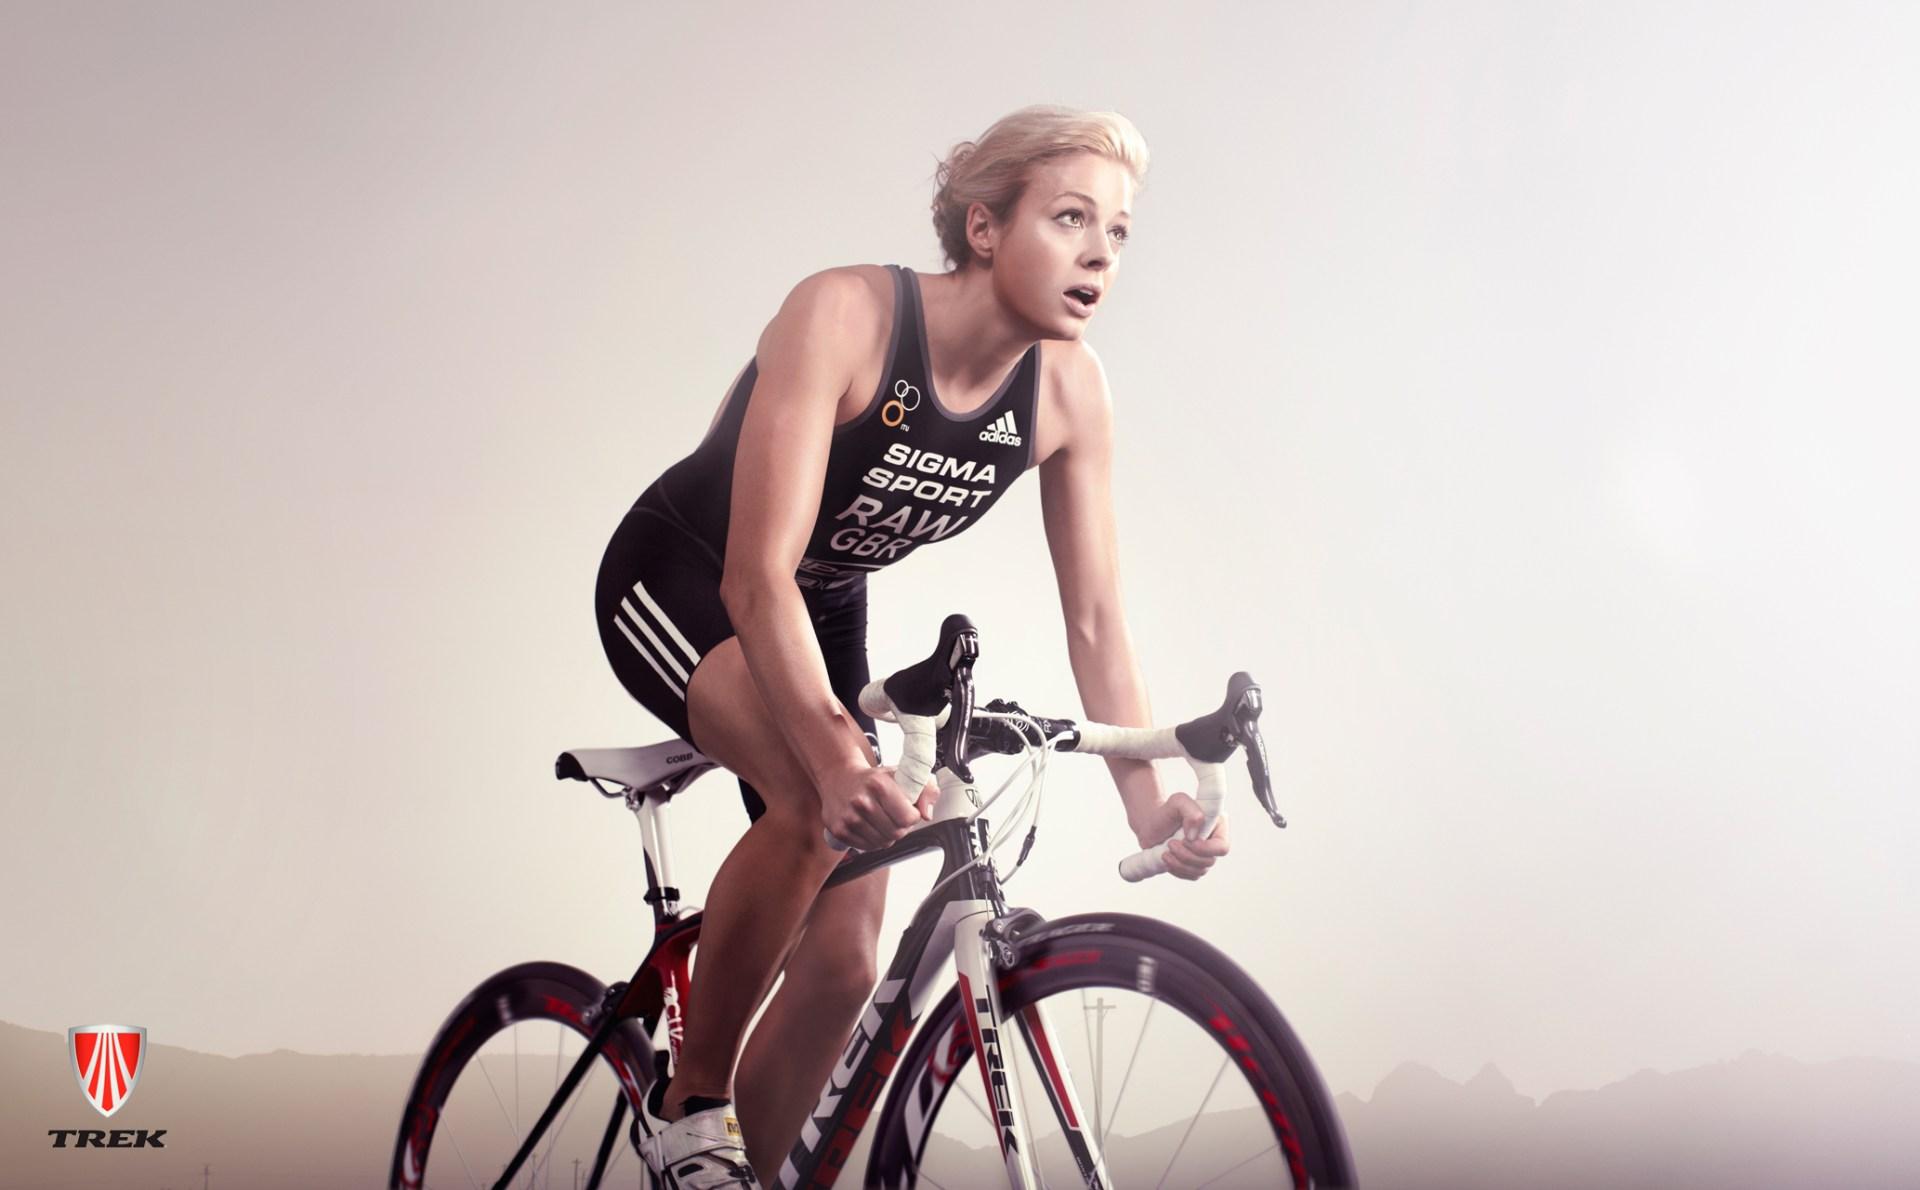 Vanessa Raw, Triathlete ad campaign